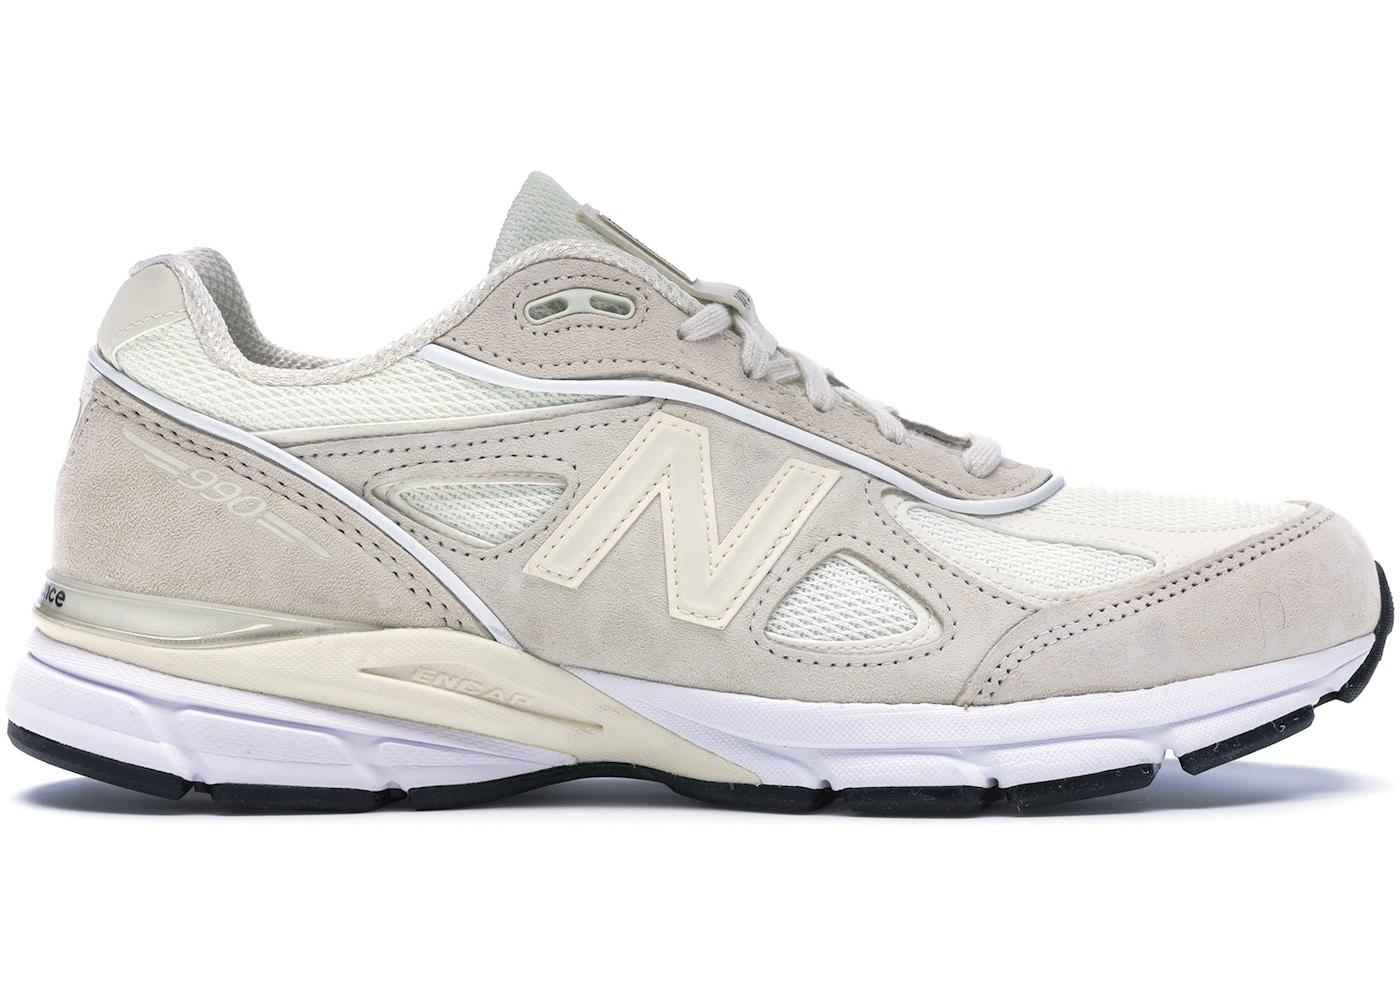 separation shoes c5697 e9612 New Balance 990v4 Stussy Cream